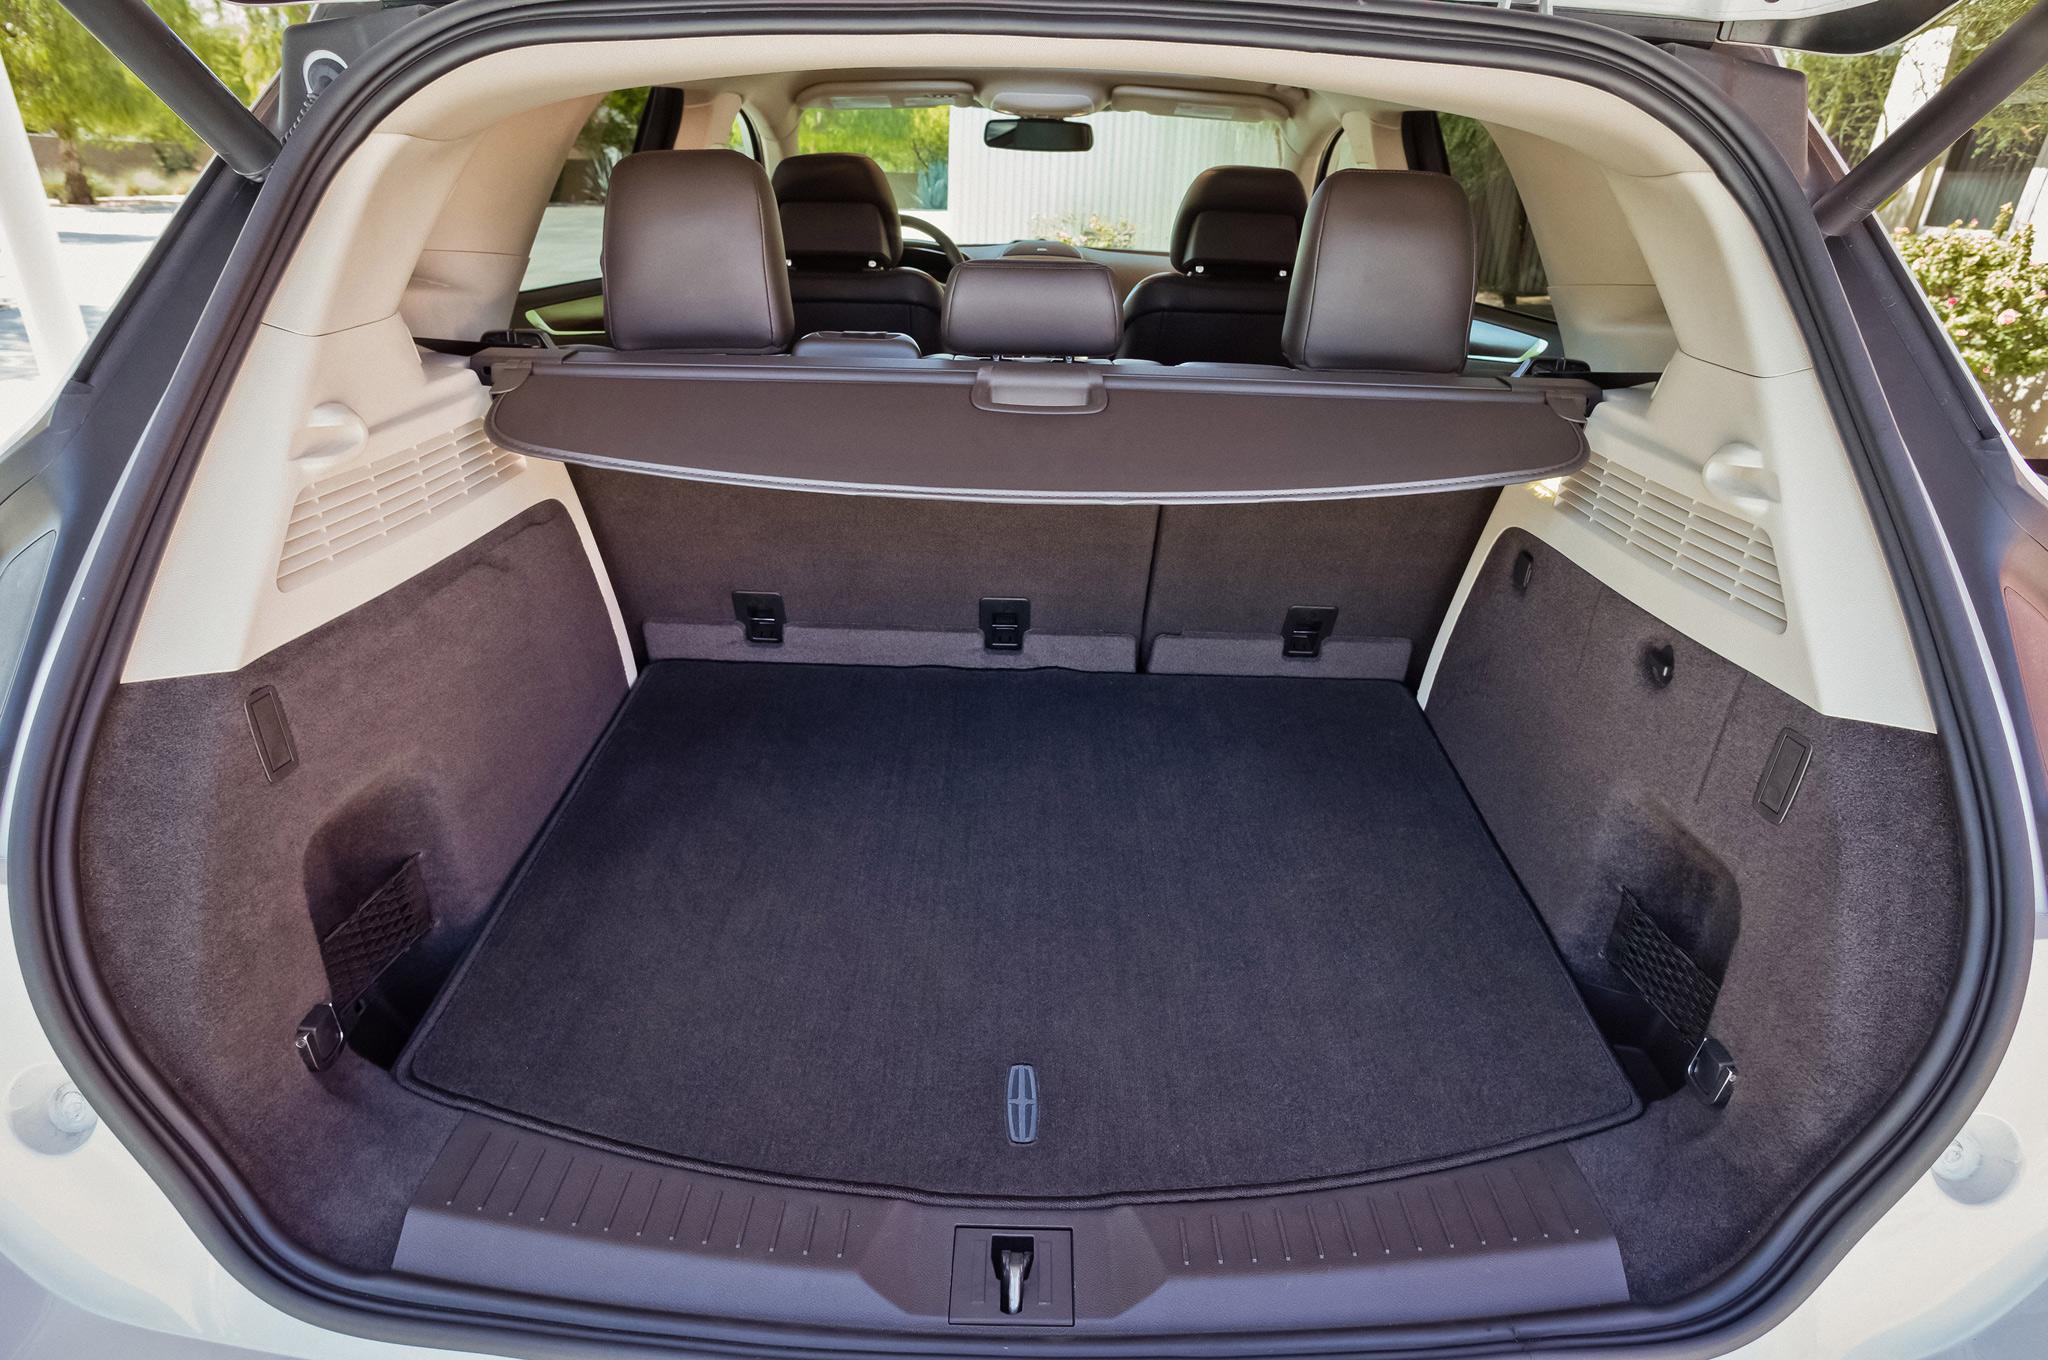 2015 Lincoln MKC Rear Interior Seats Up